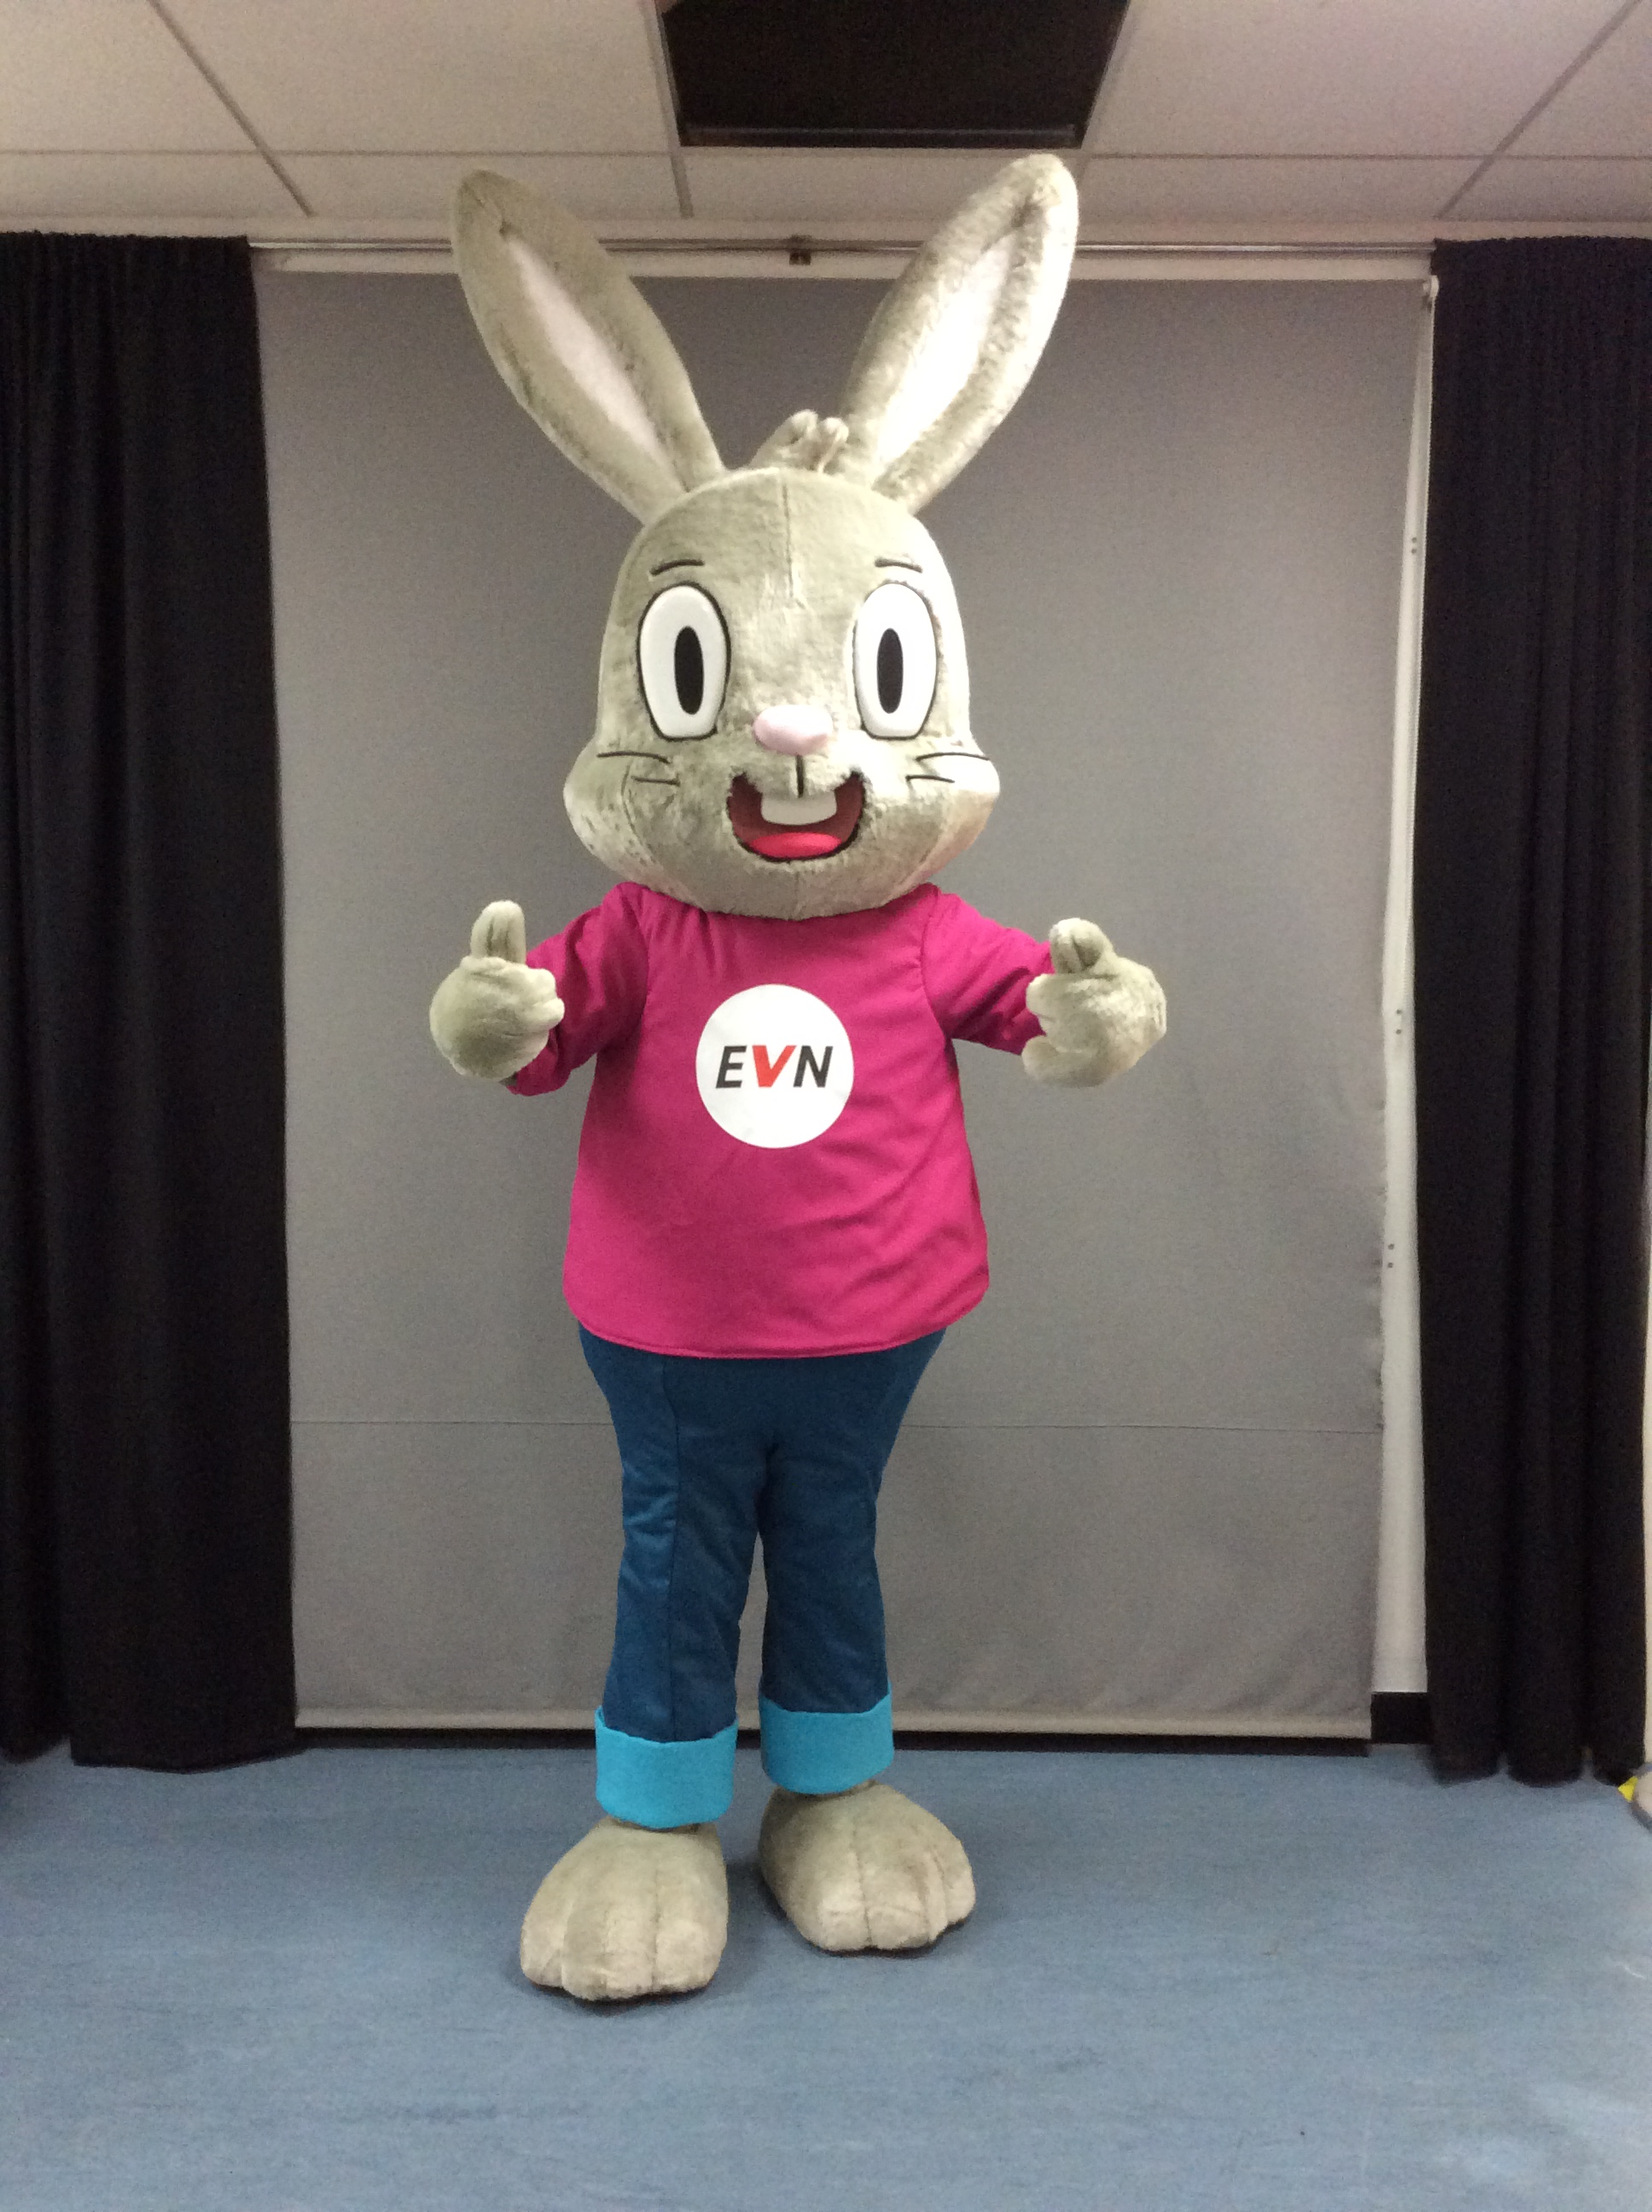 EVN bunny